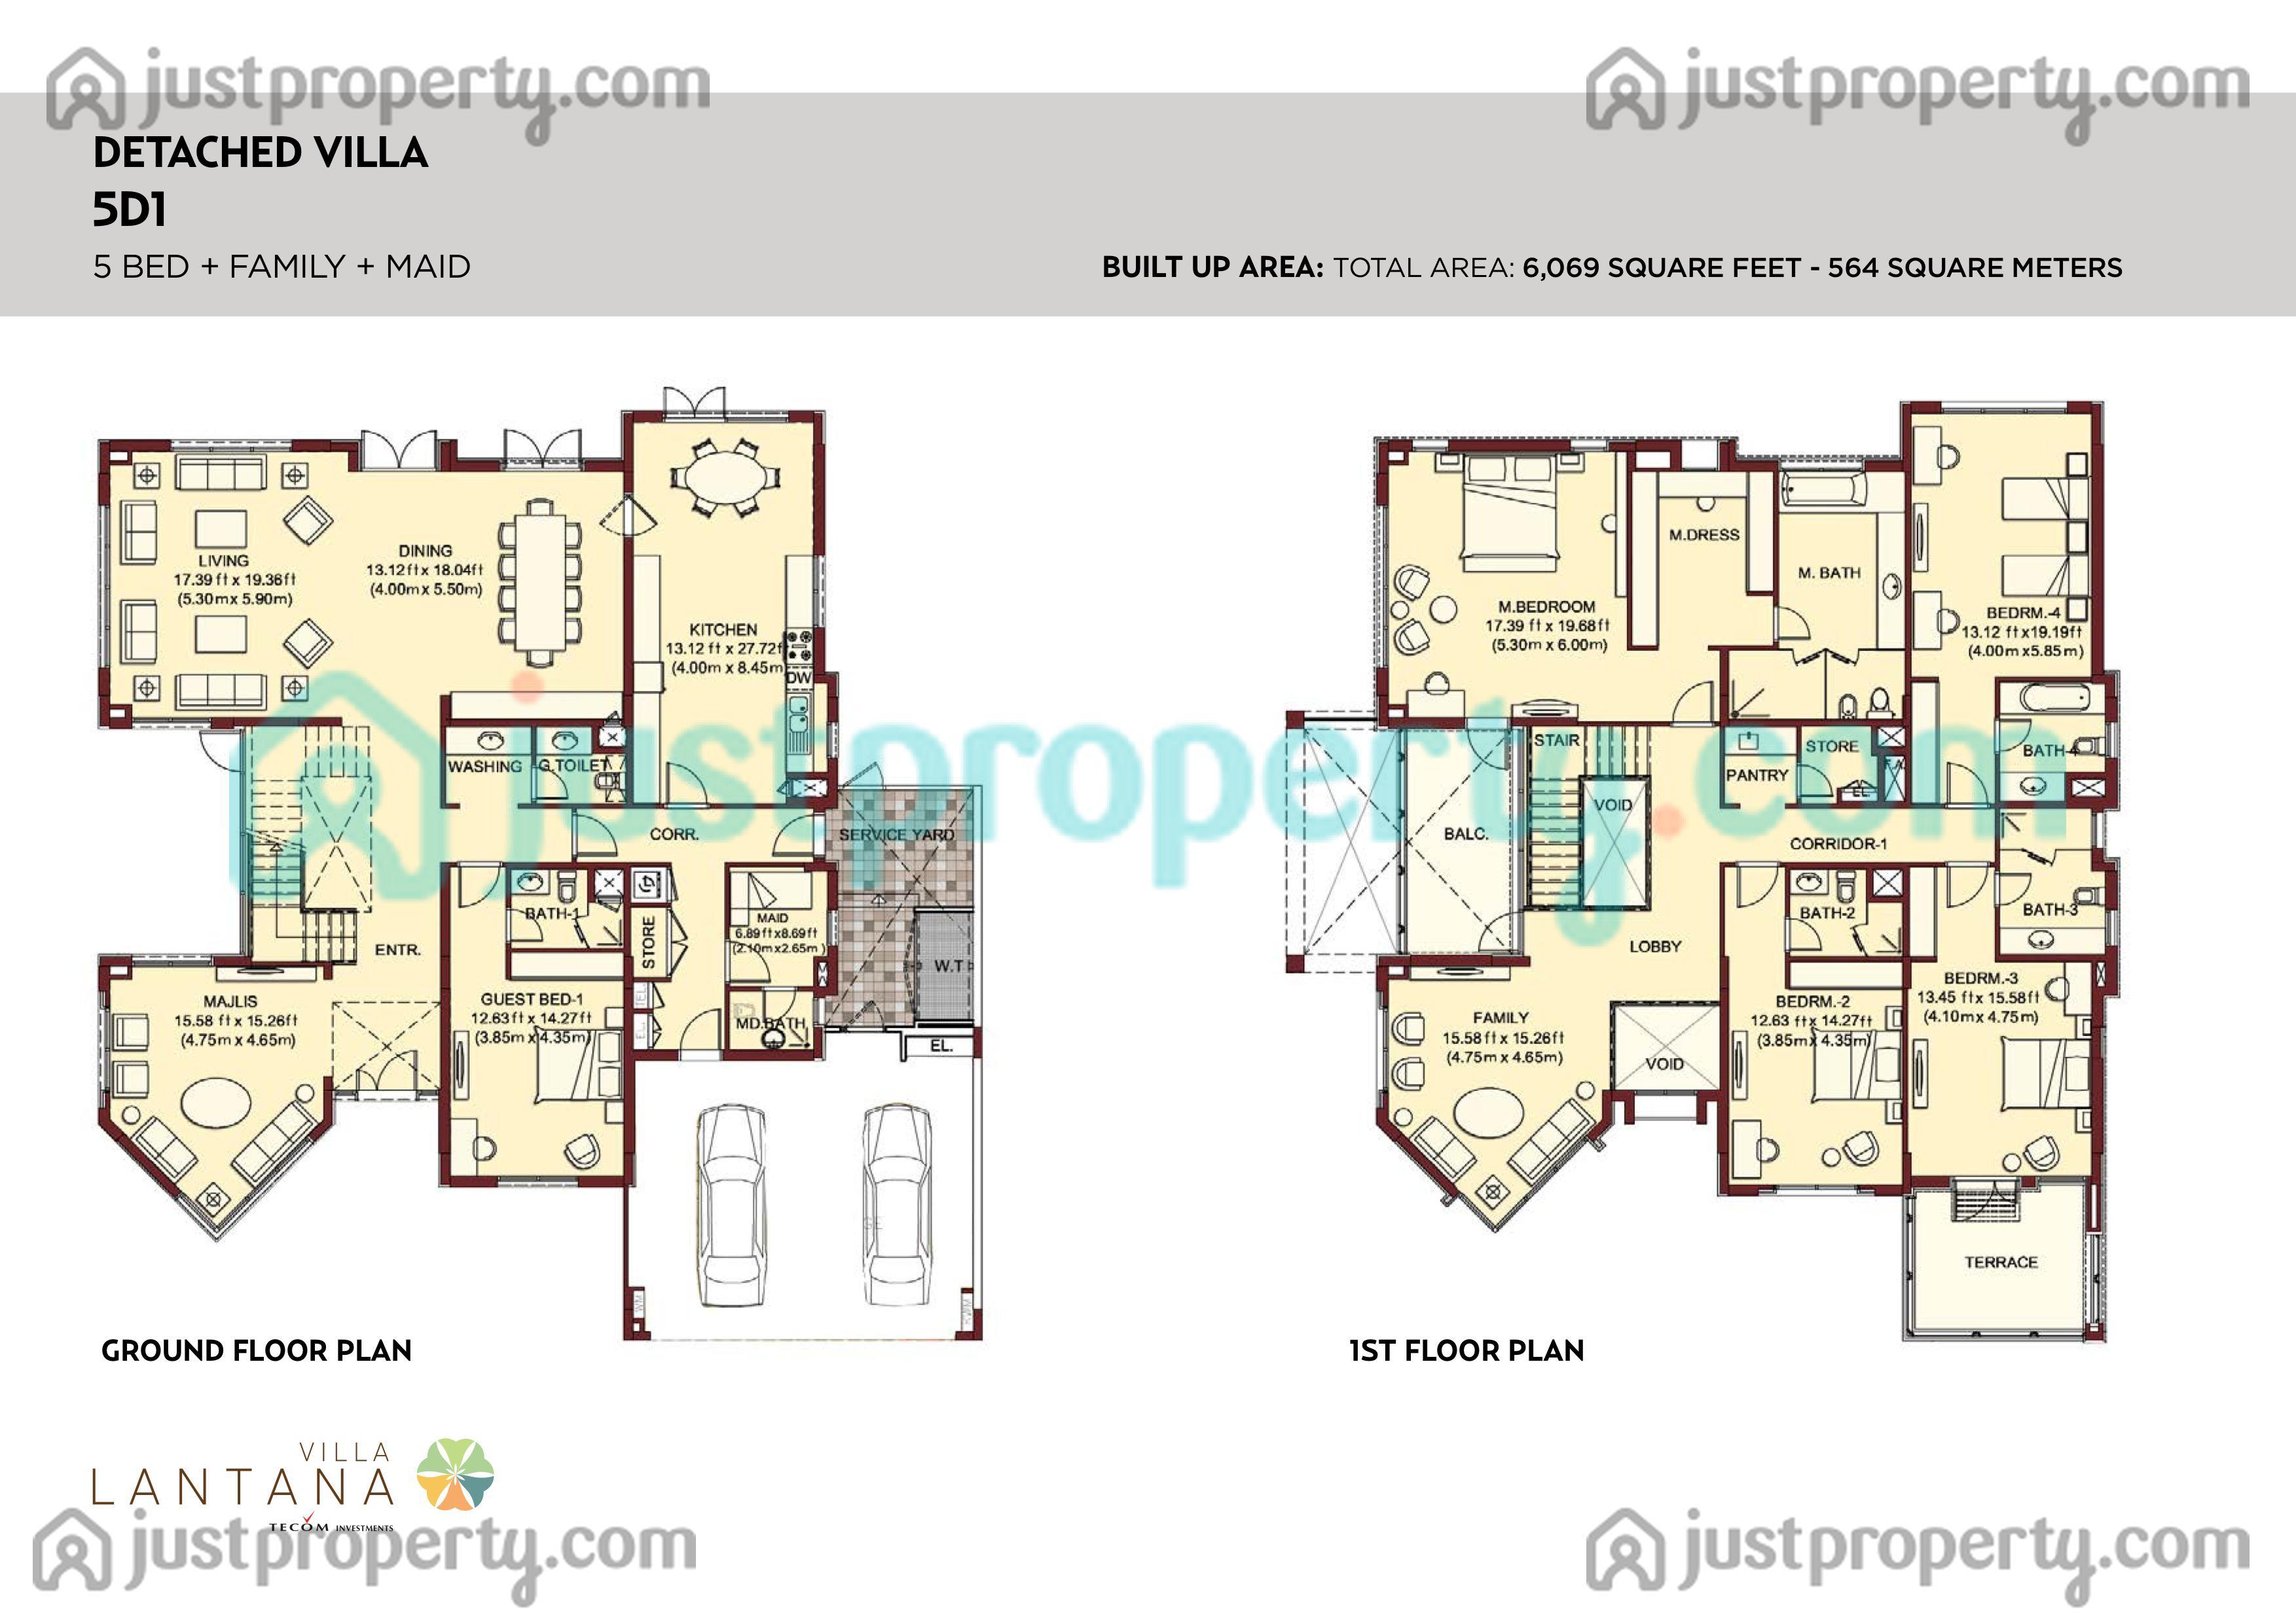 lantana villas floor plans justproperty com florence ii lantana floorplans at olde cypress in naples fl